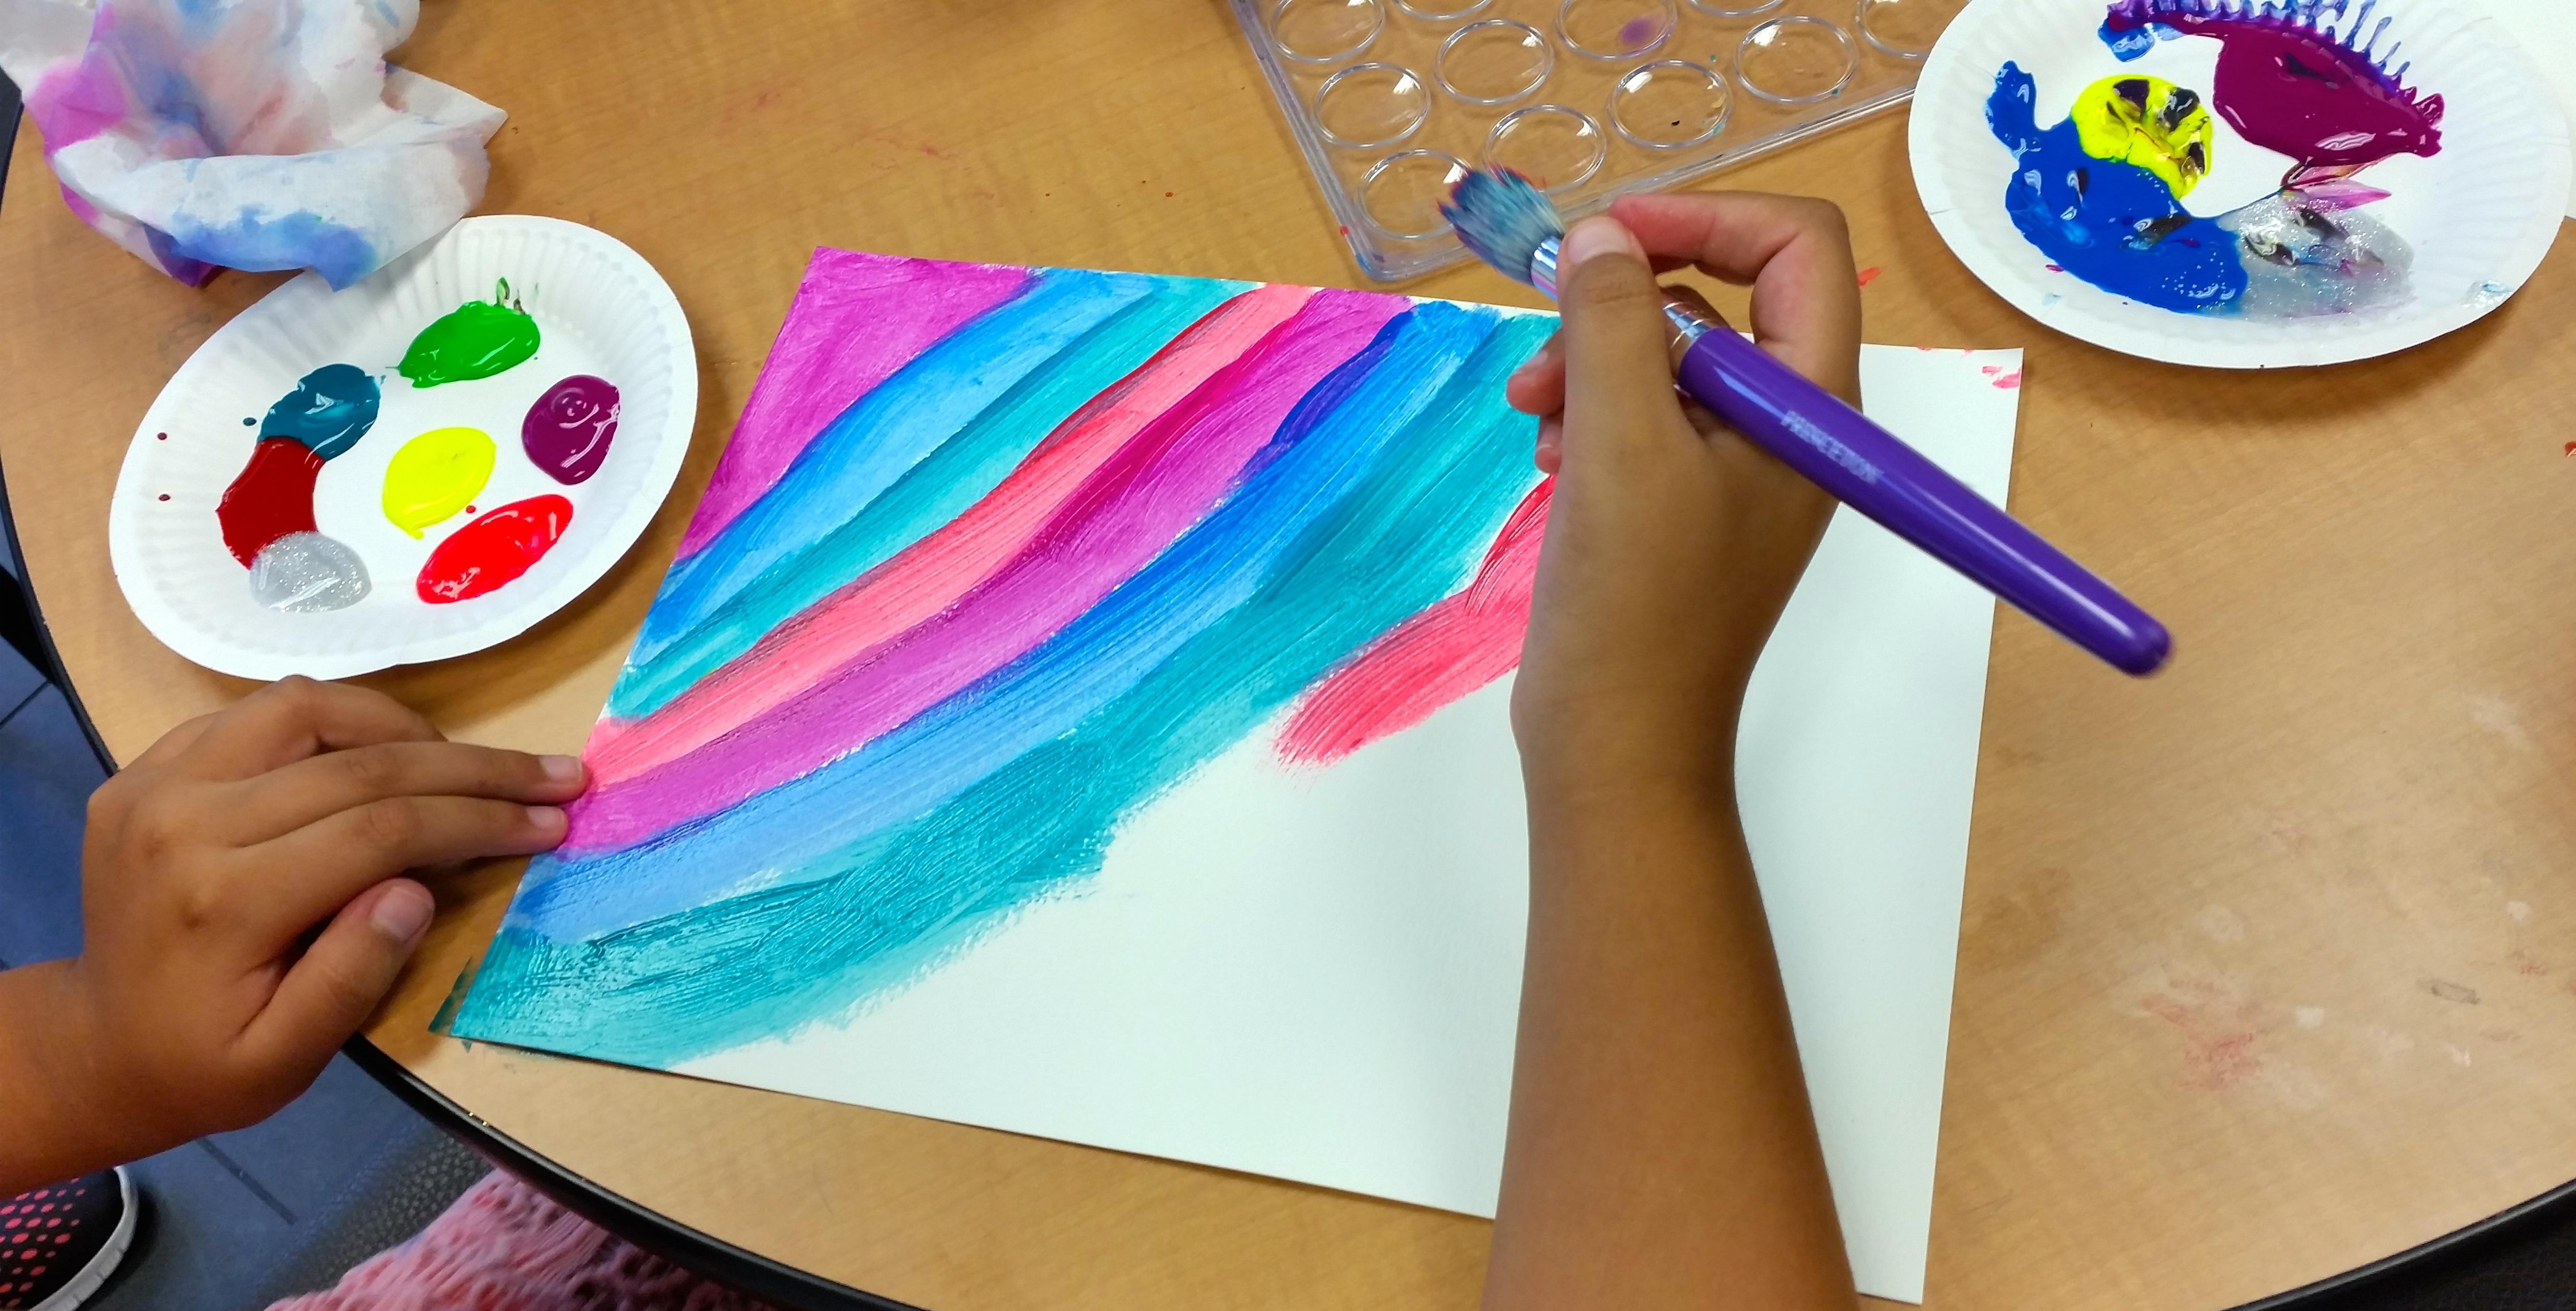 Exploring the rainbow fish through art